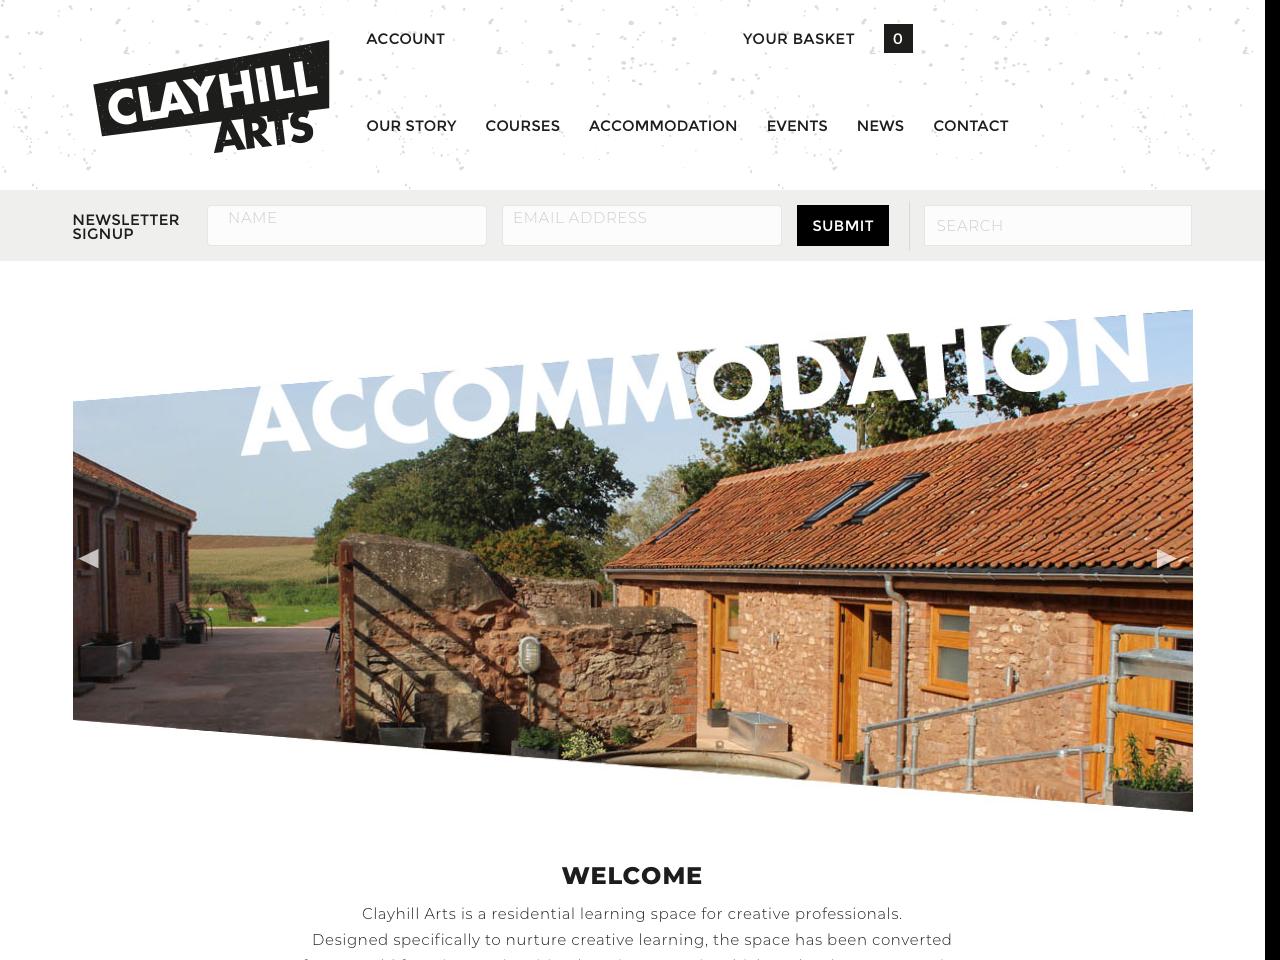 Clayhill Arts